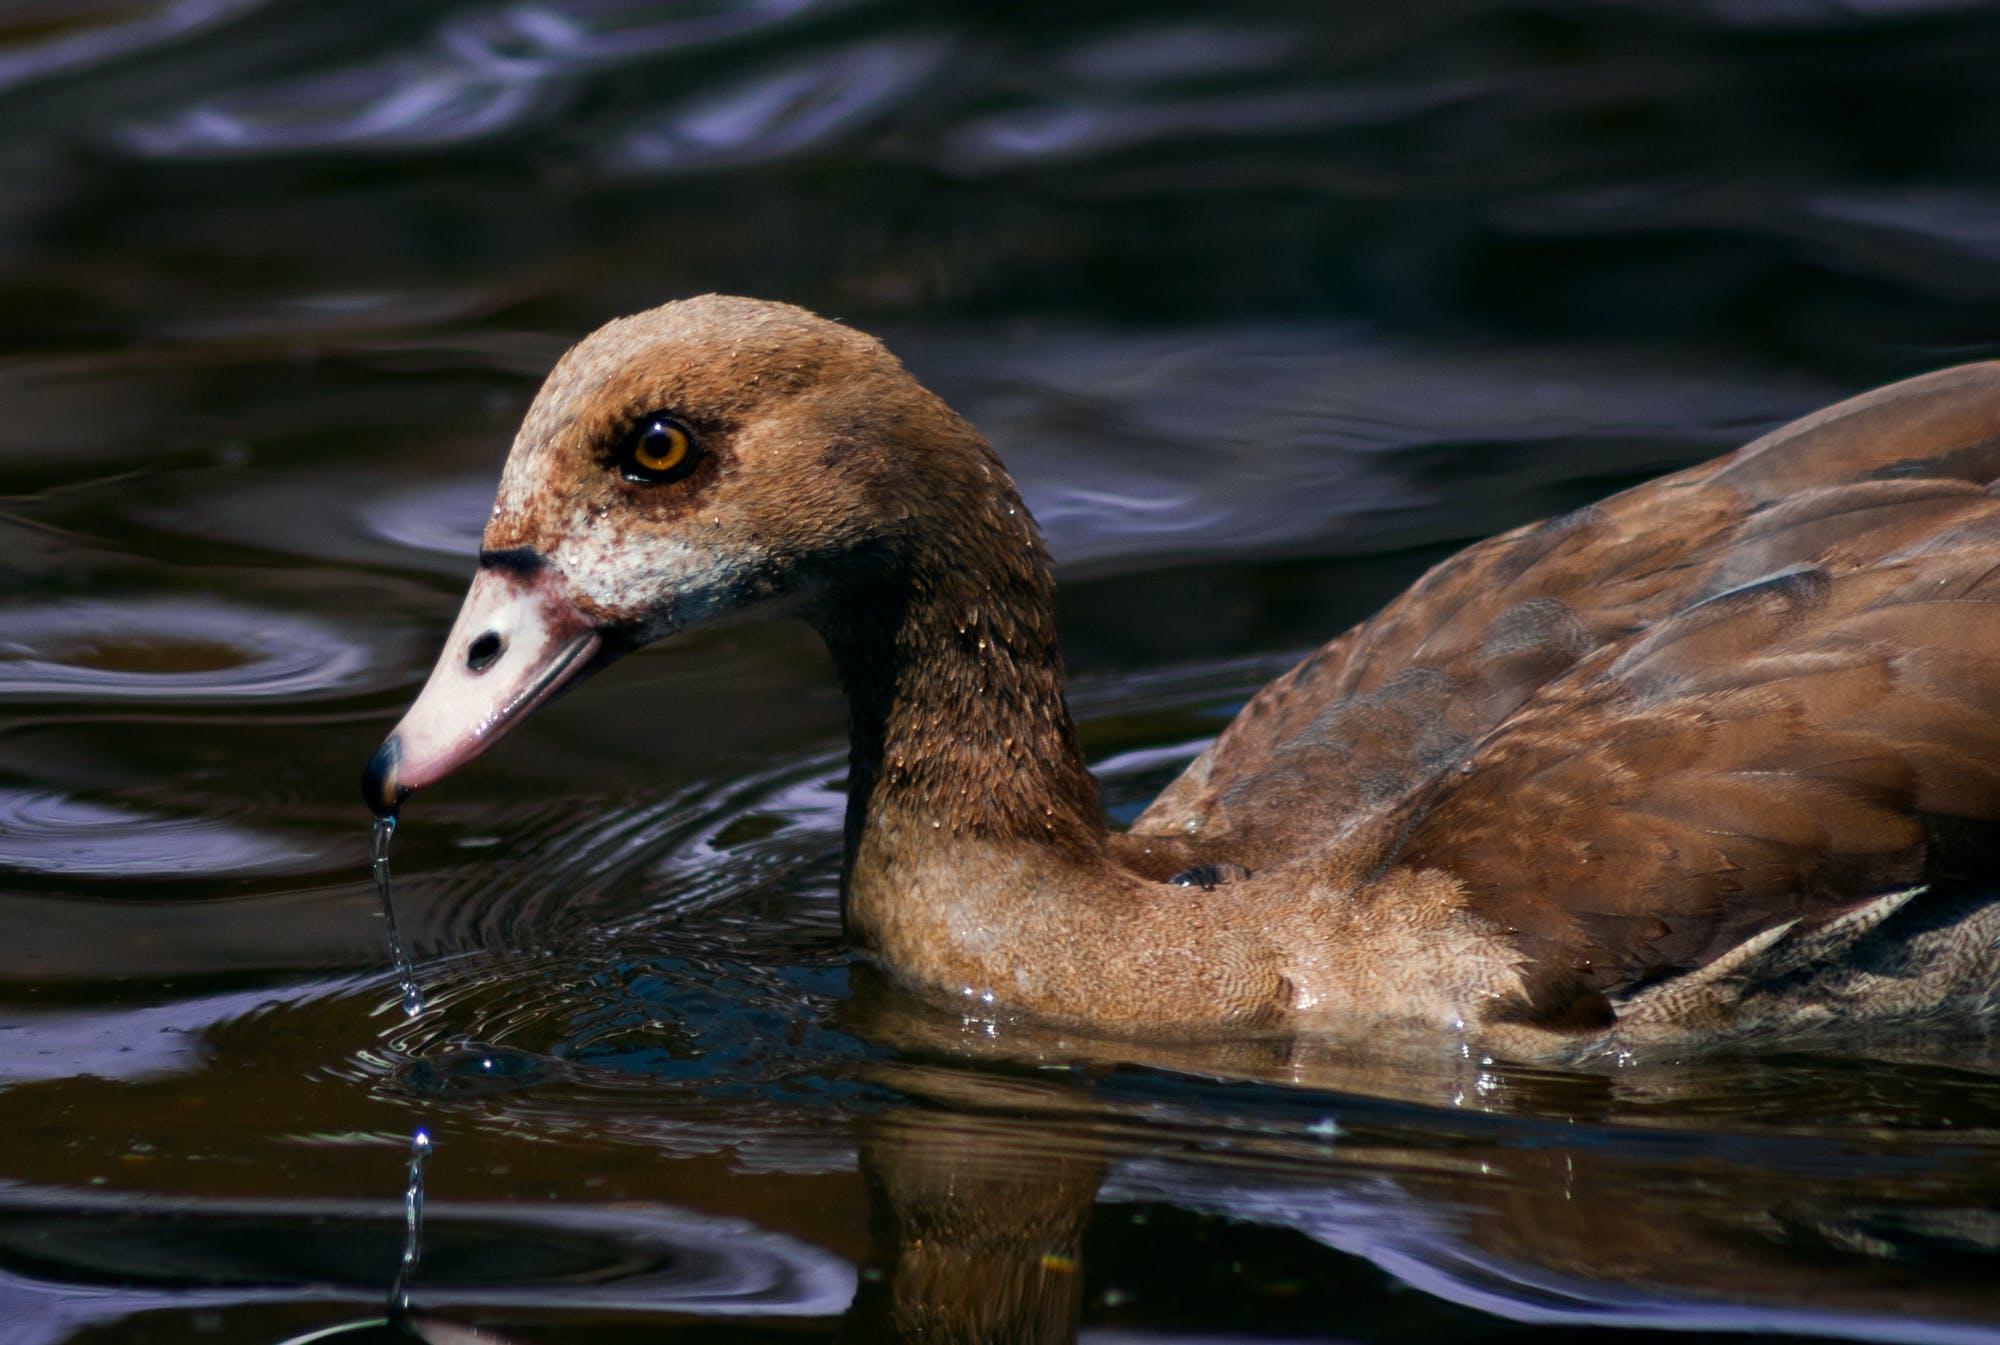 animal, avian, beak